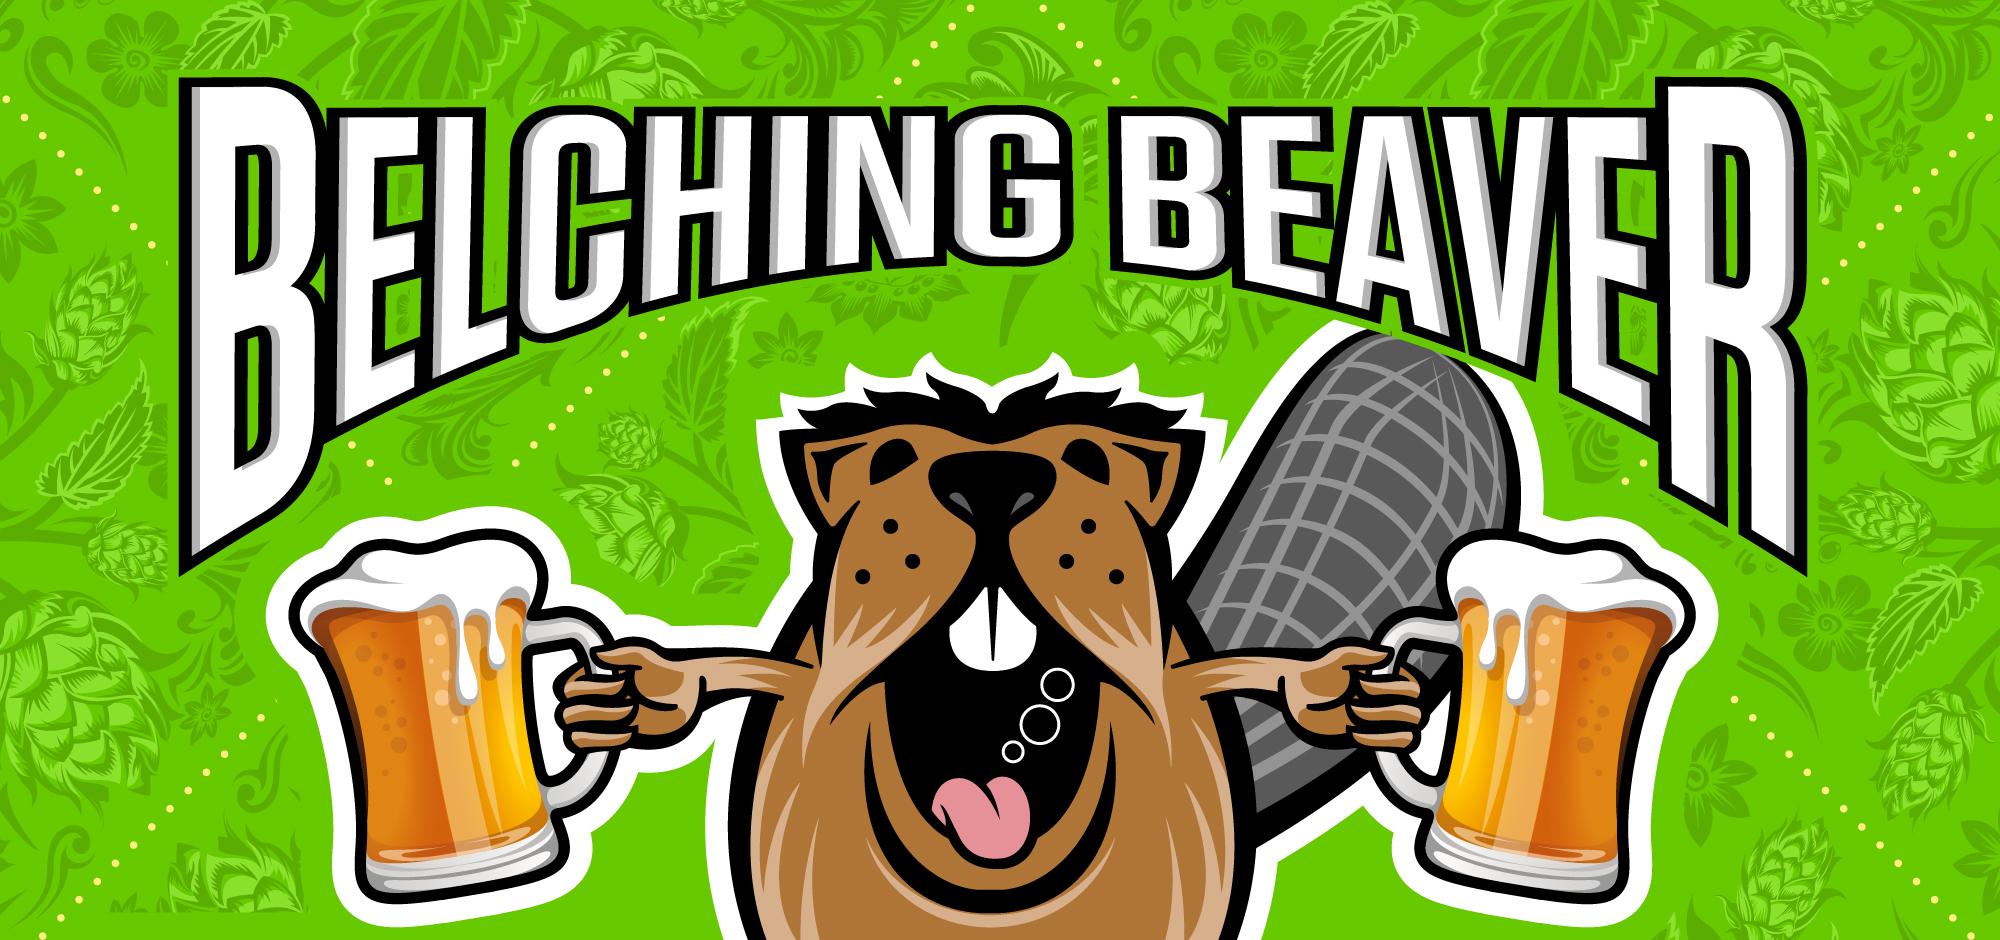 Belching Beaver-3